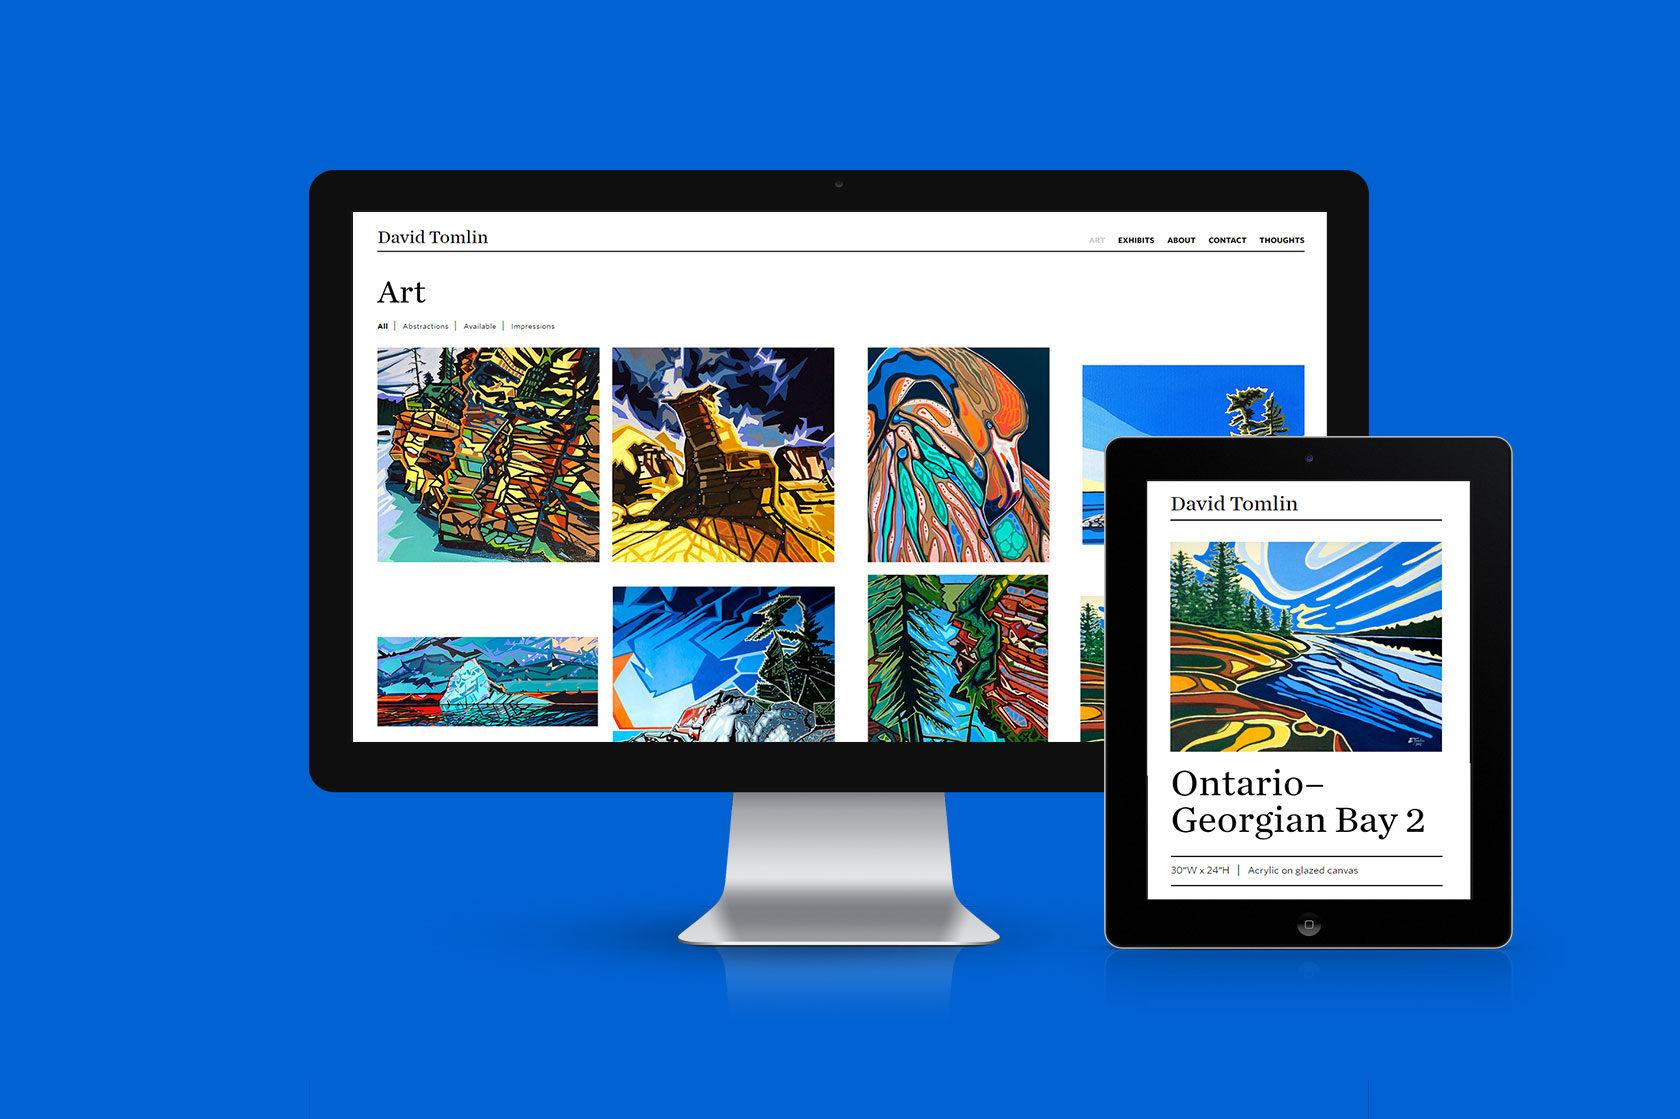 David Tomlin Website Design by Furia